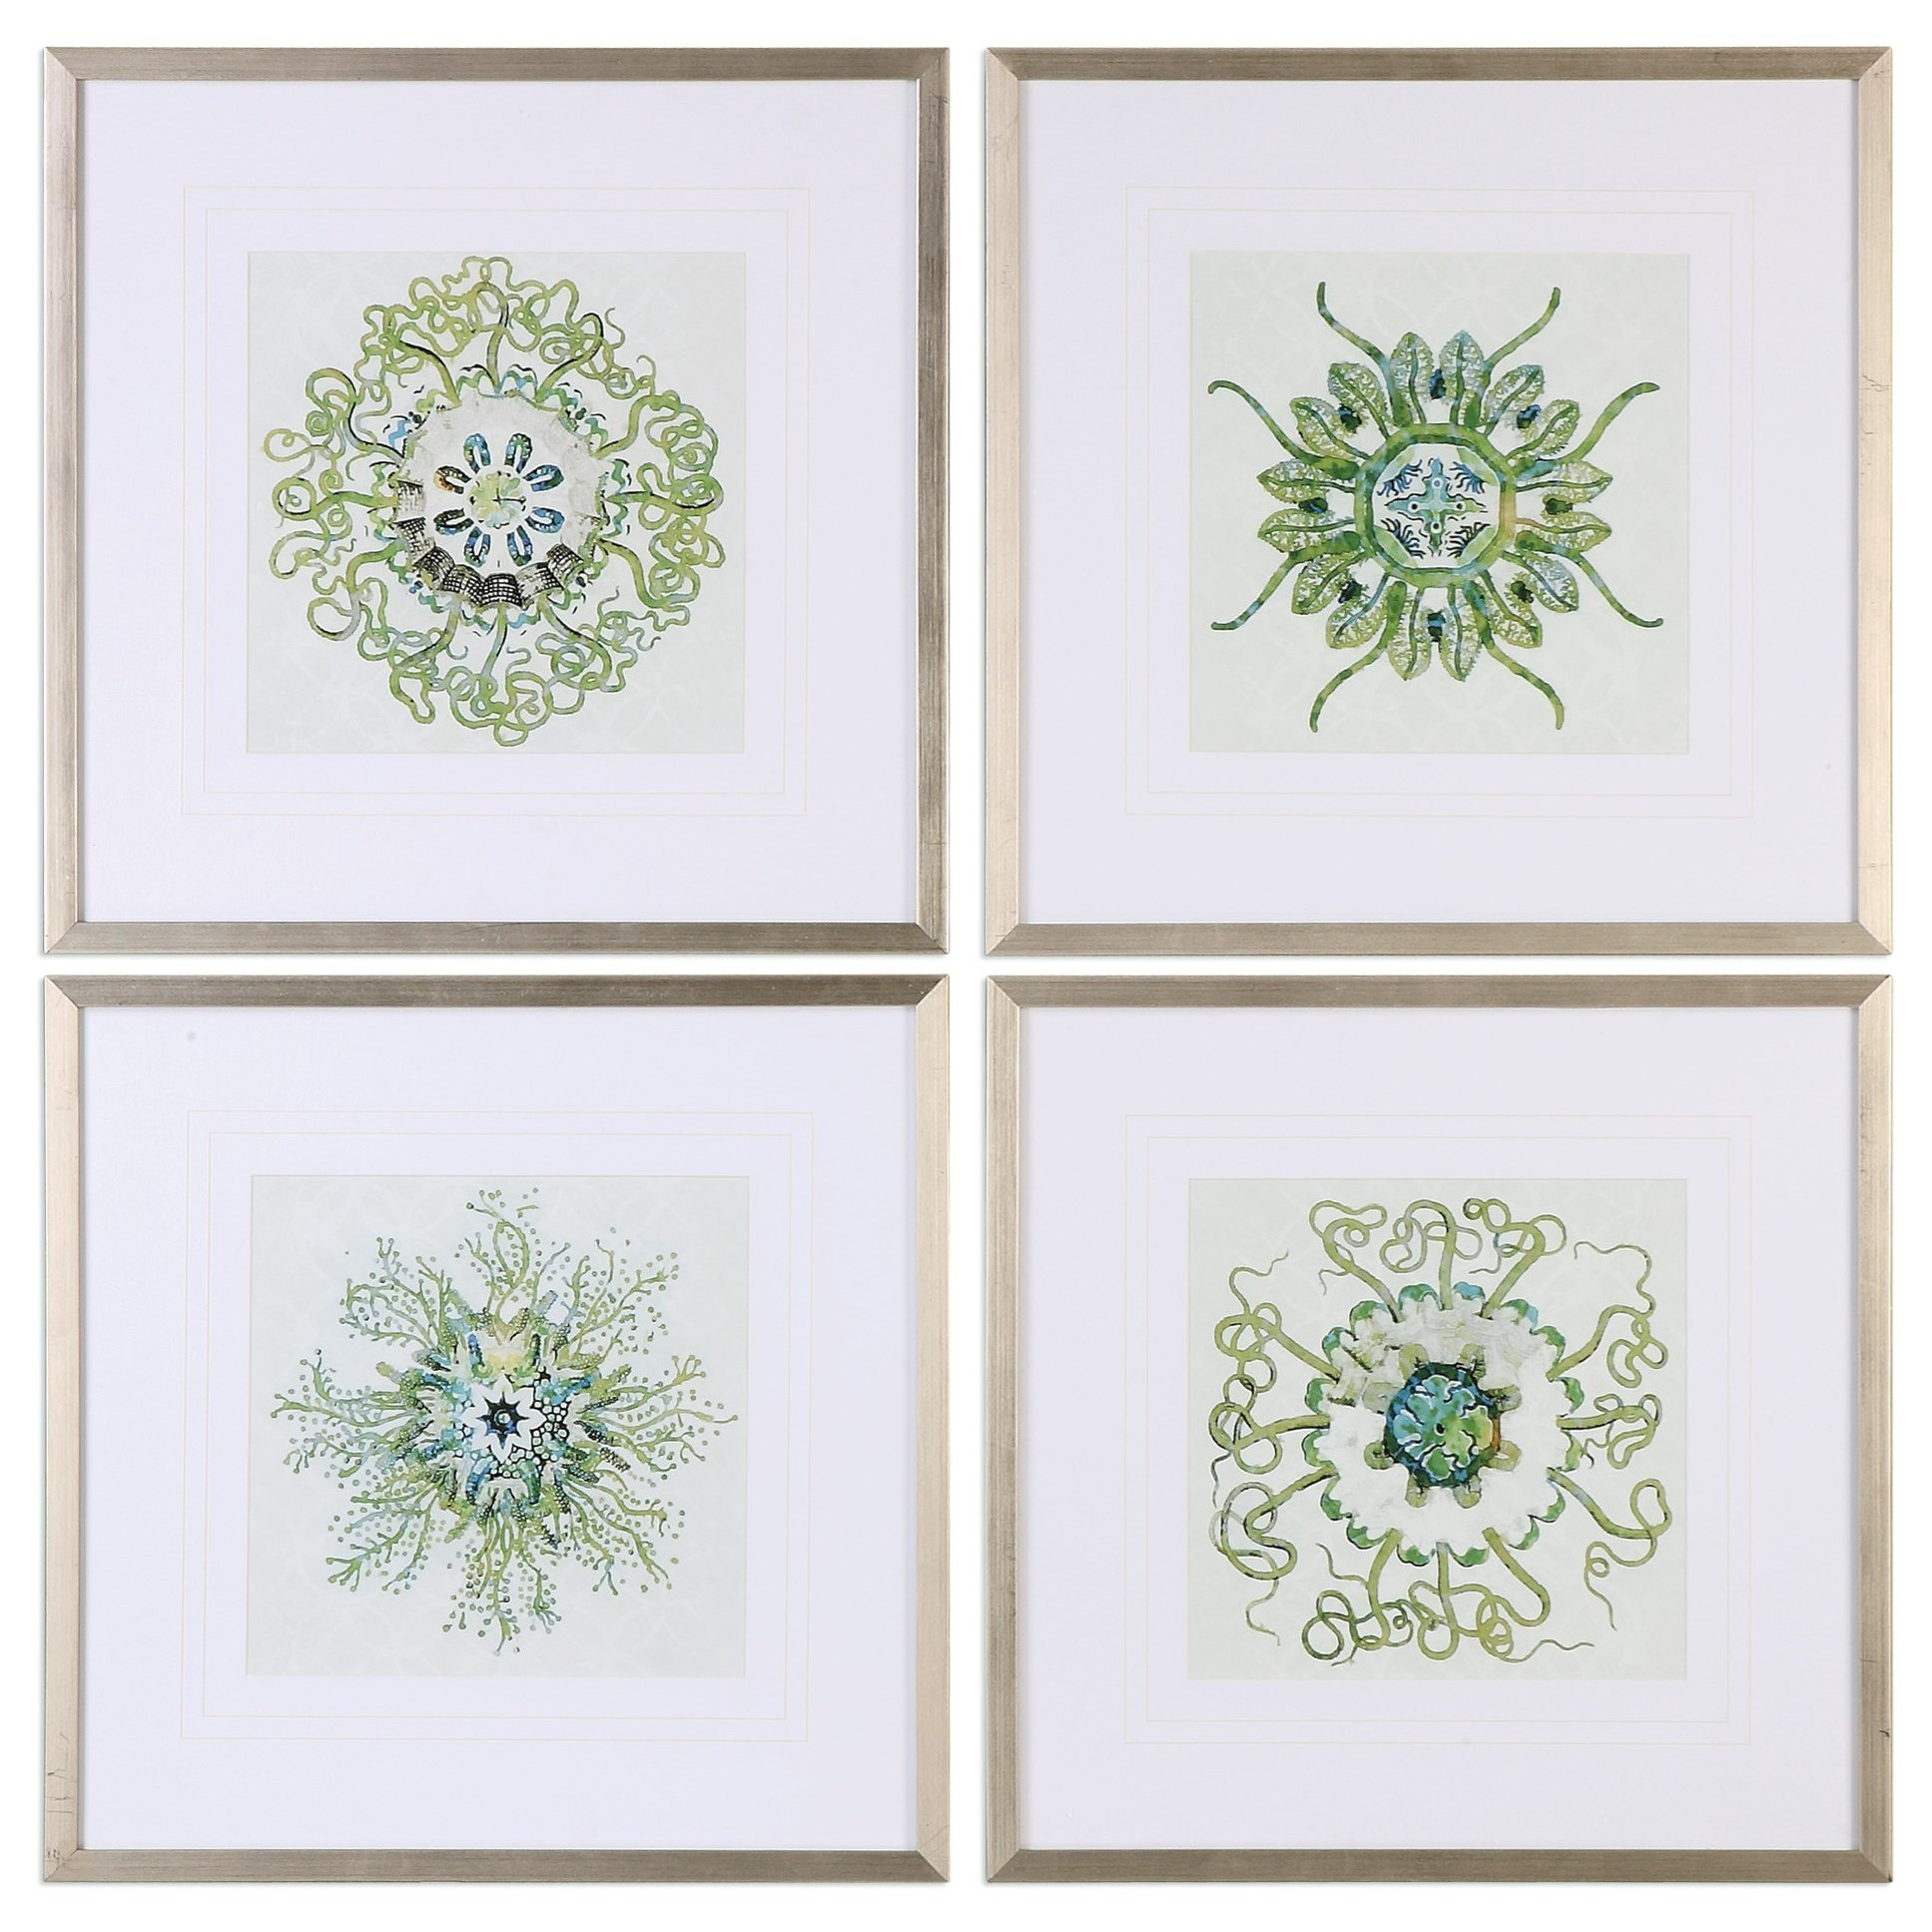 Uttermost Art Organic Symbols (Set of 4) - Item Number: 33656